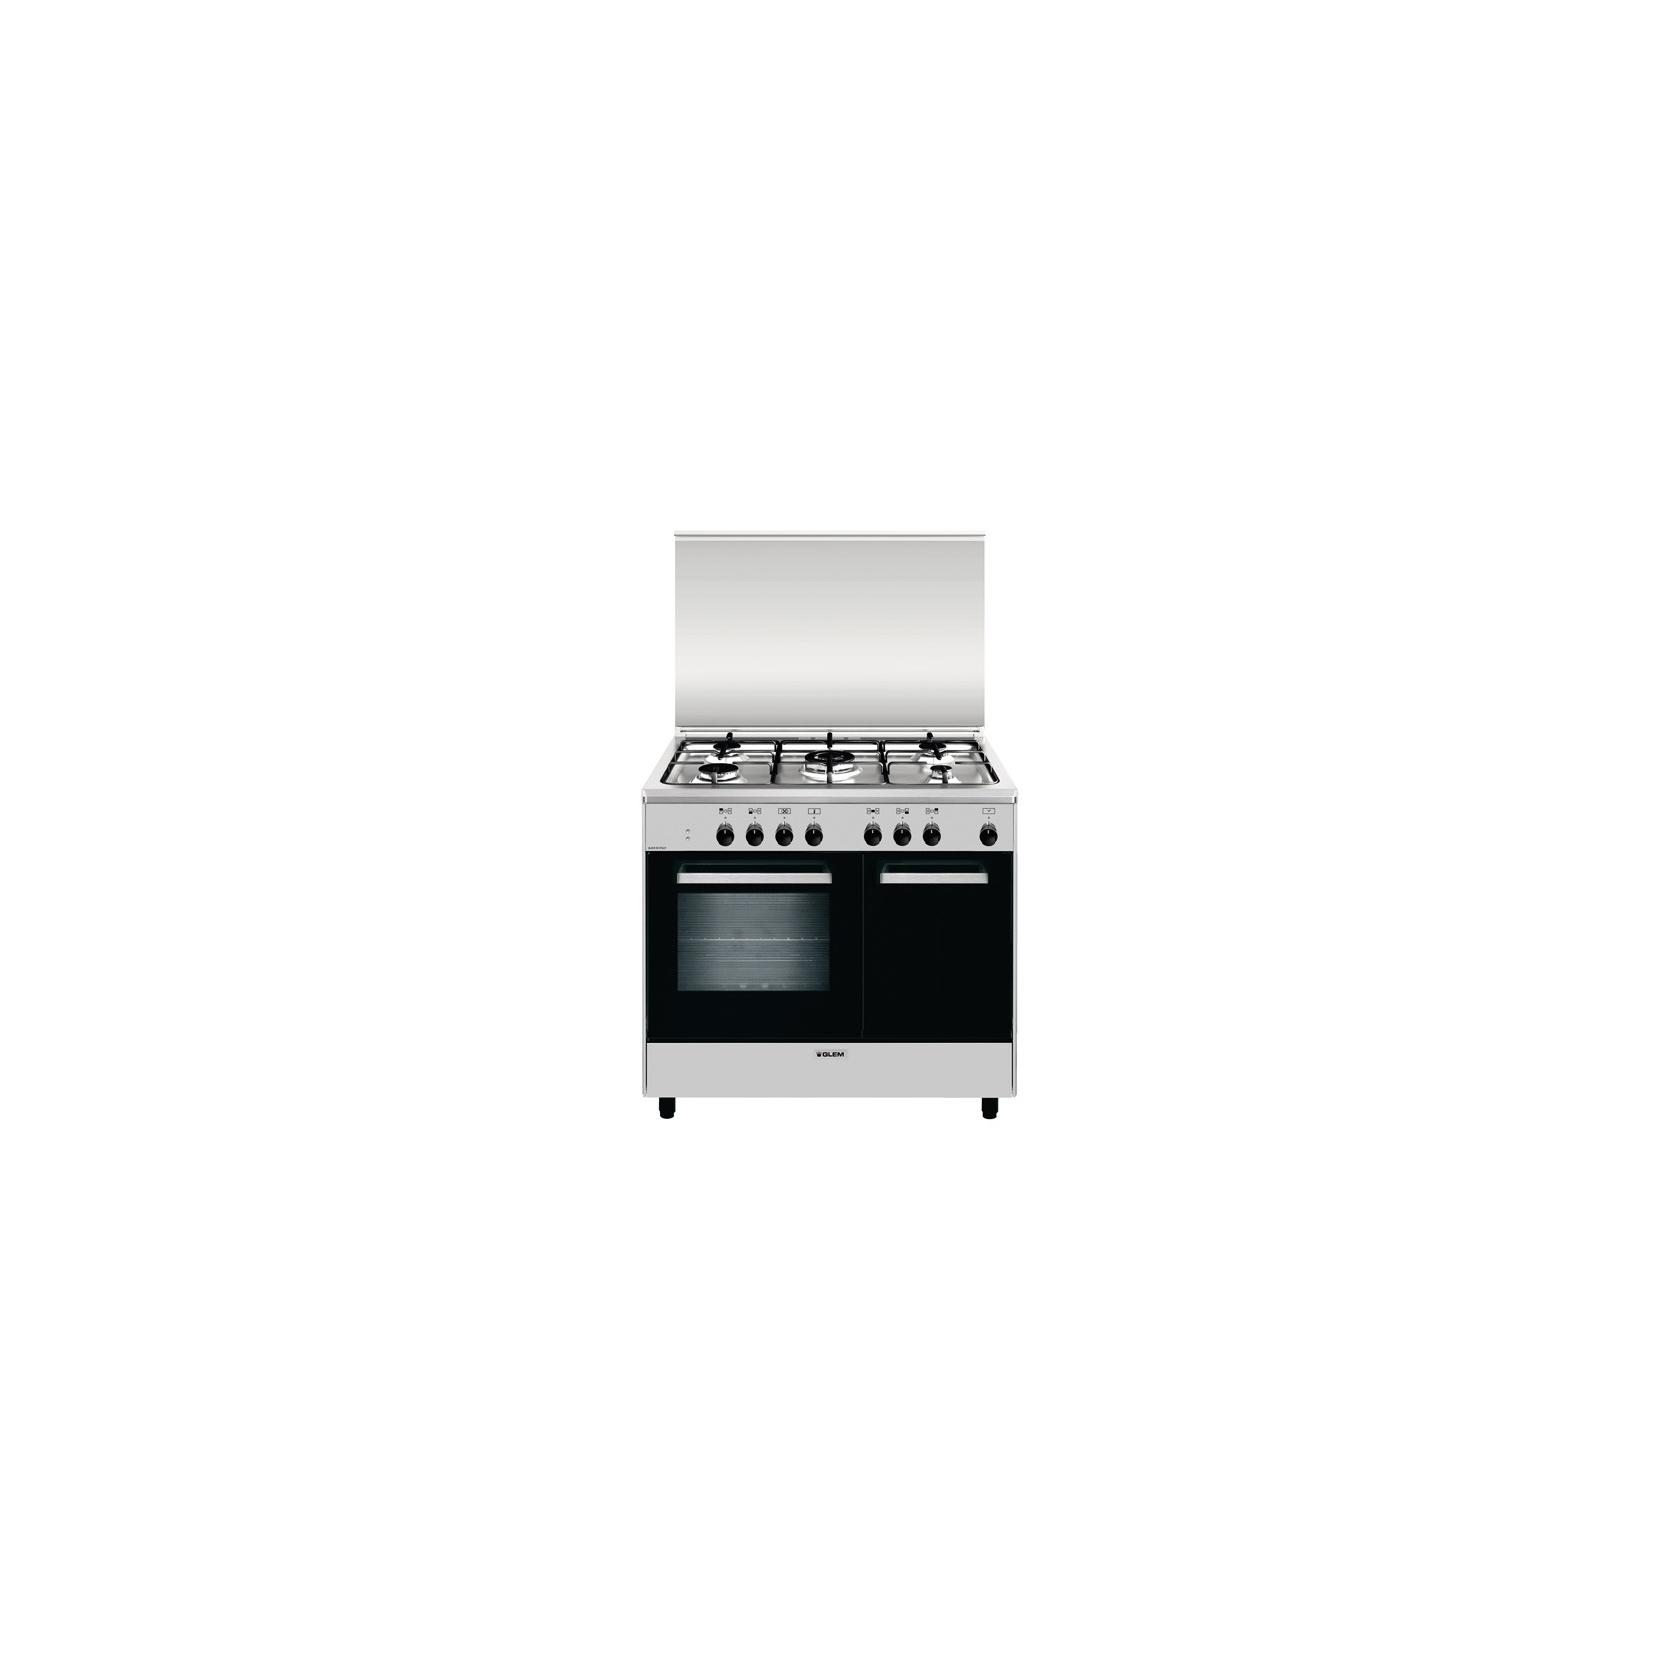 Cucina glem ar965mi6 90x60 libera installazione piano - Cucine a gas libera installazione ...